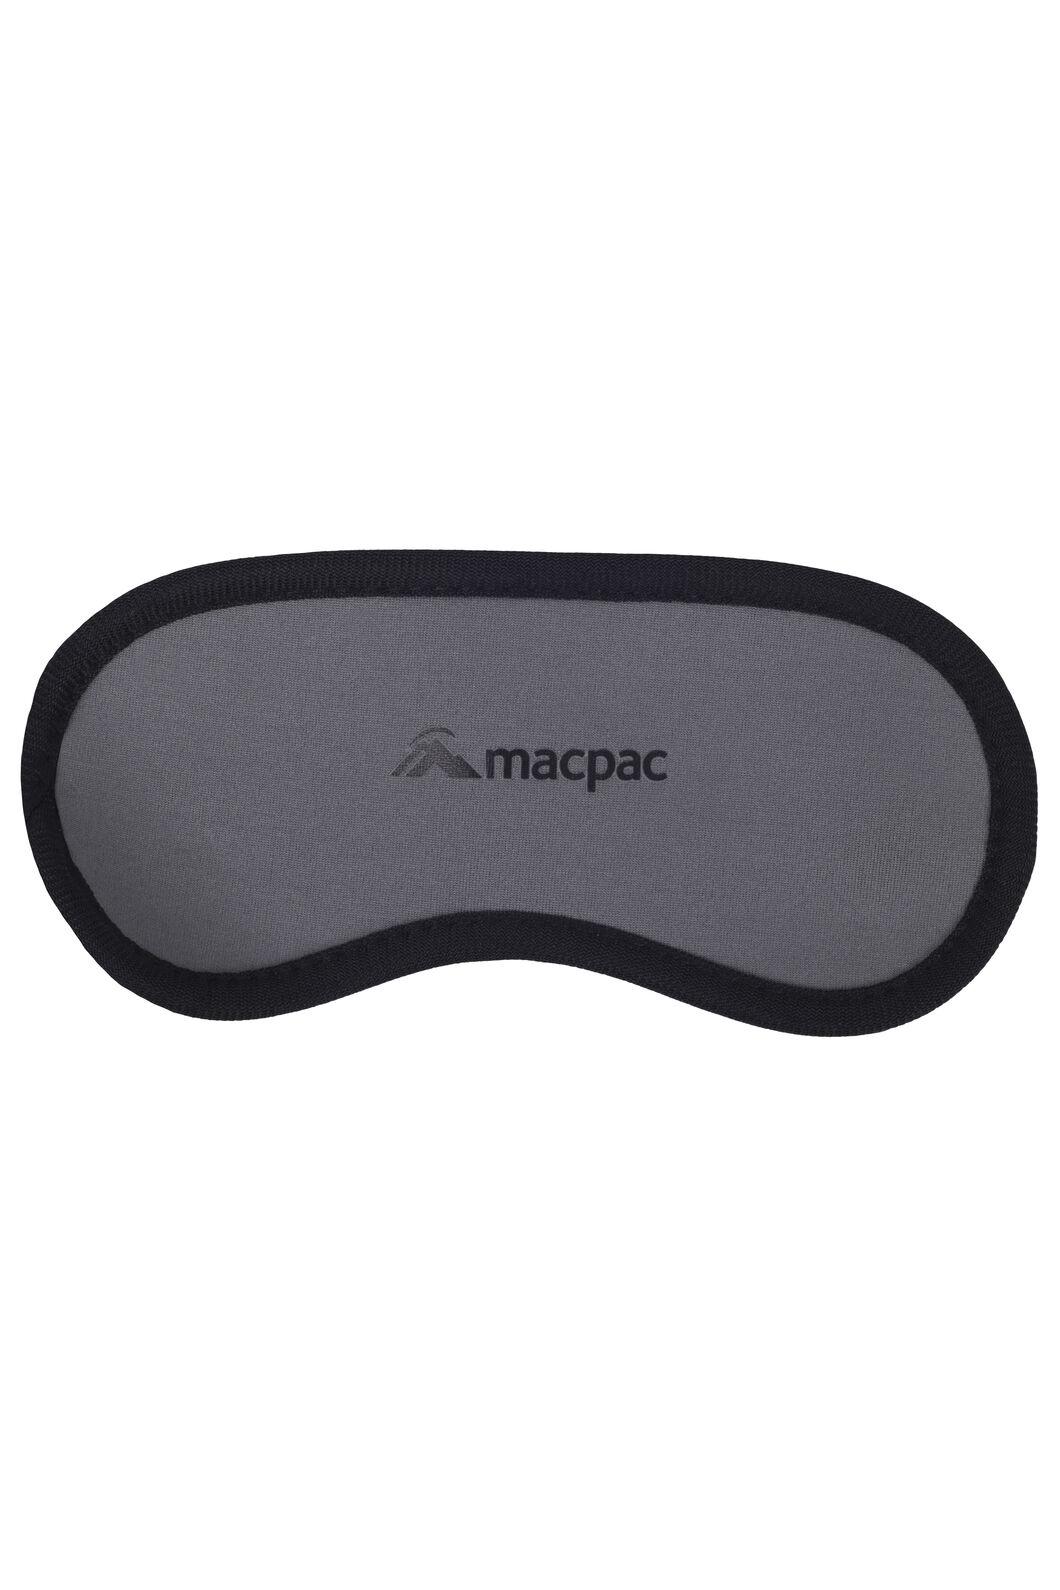 Macpac Neo Eyemask, Charcoal/Black, hi-res